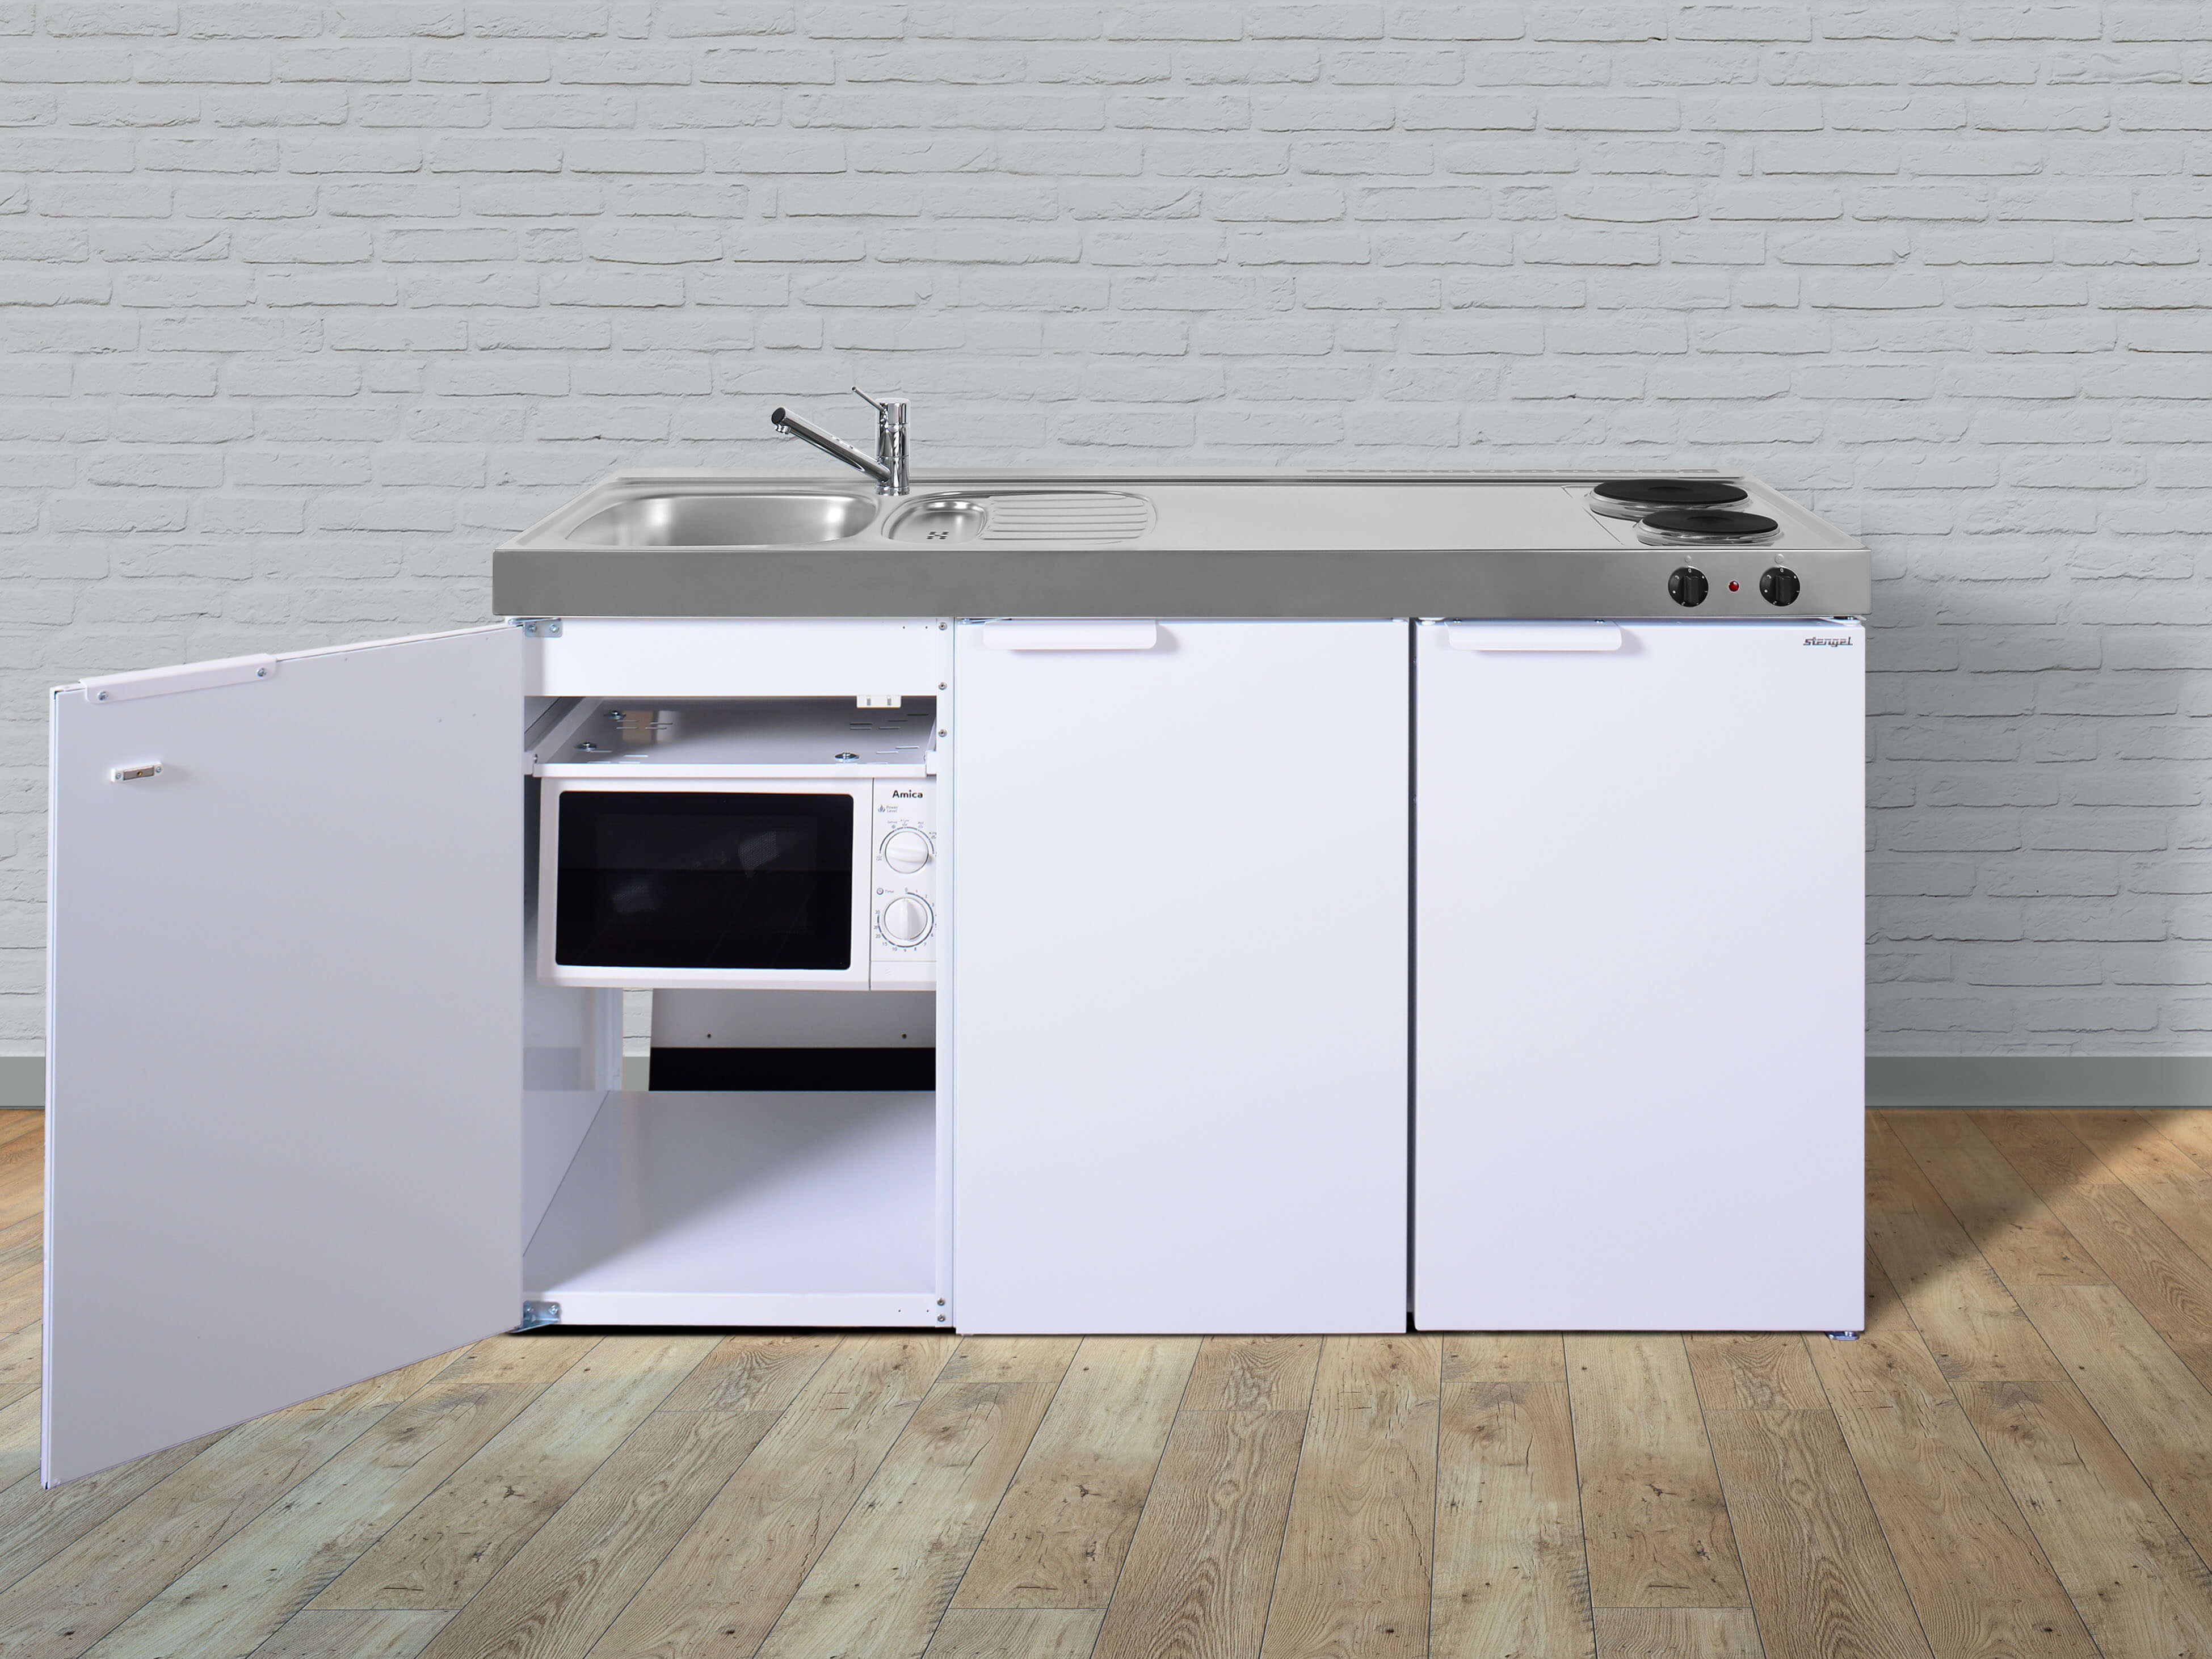 stengel minik che kitchenline mkm 150 minik chen online. Black Bedroom Furniture Sets. Home Design Ideas